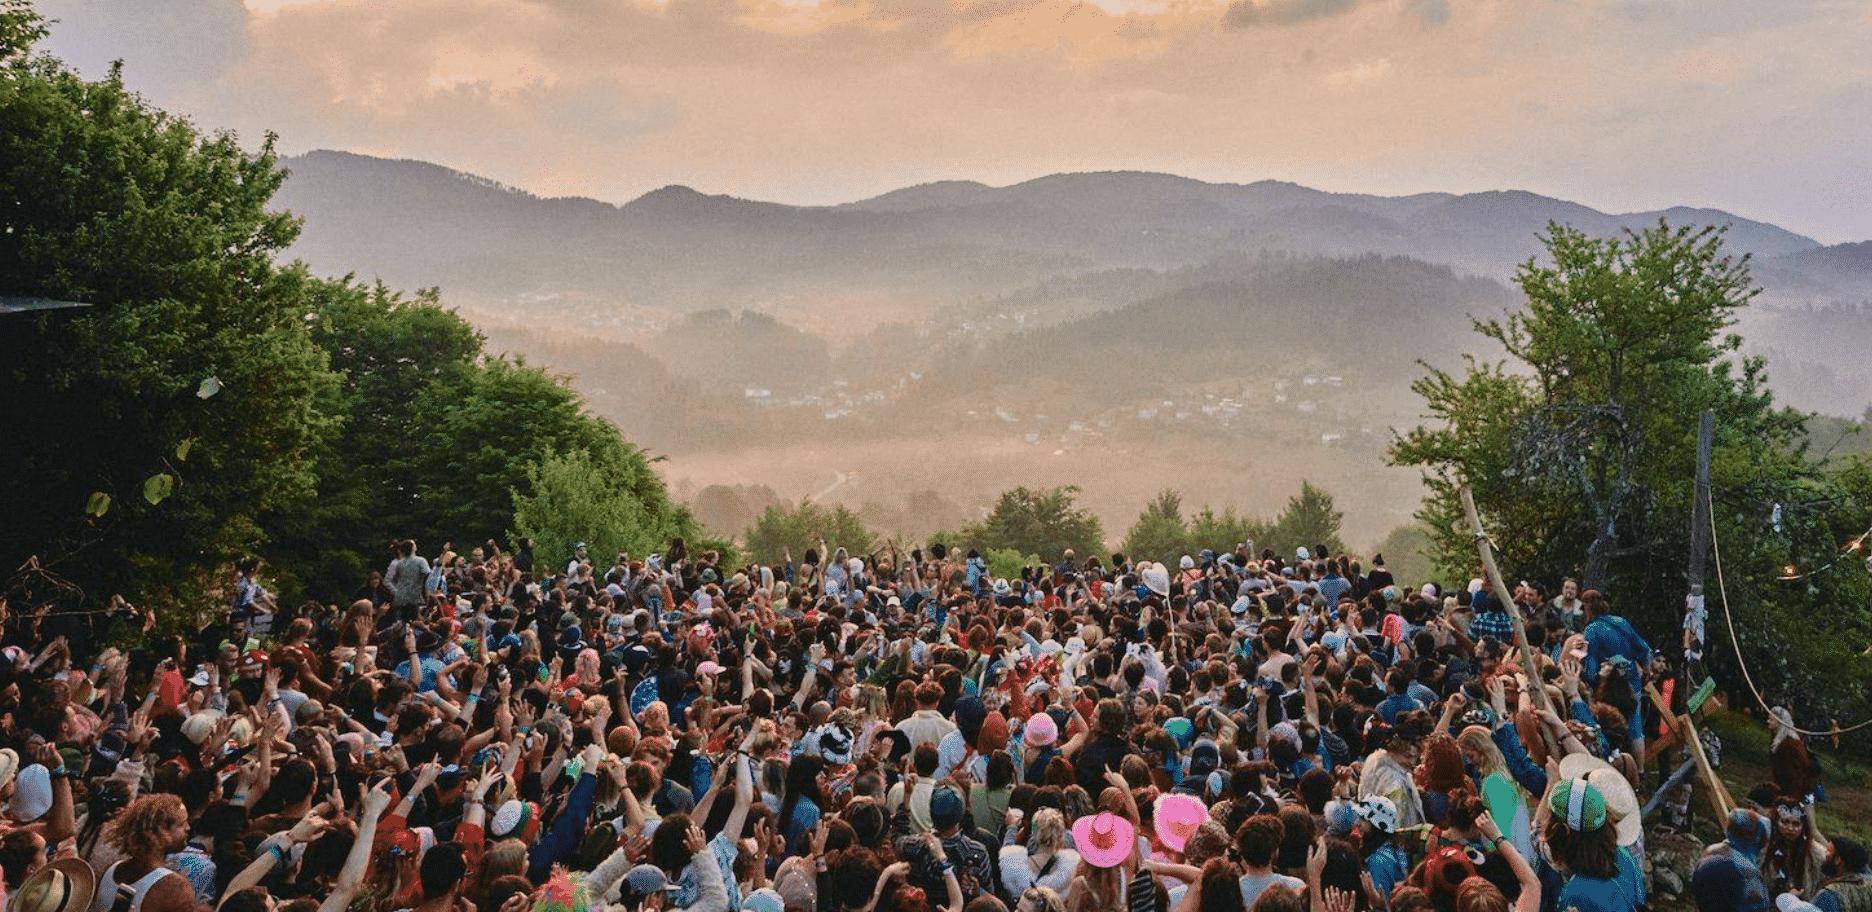 2020 festival bucket list